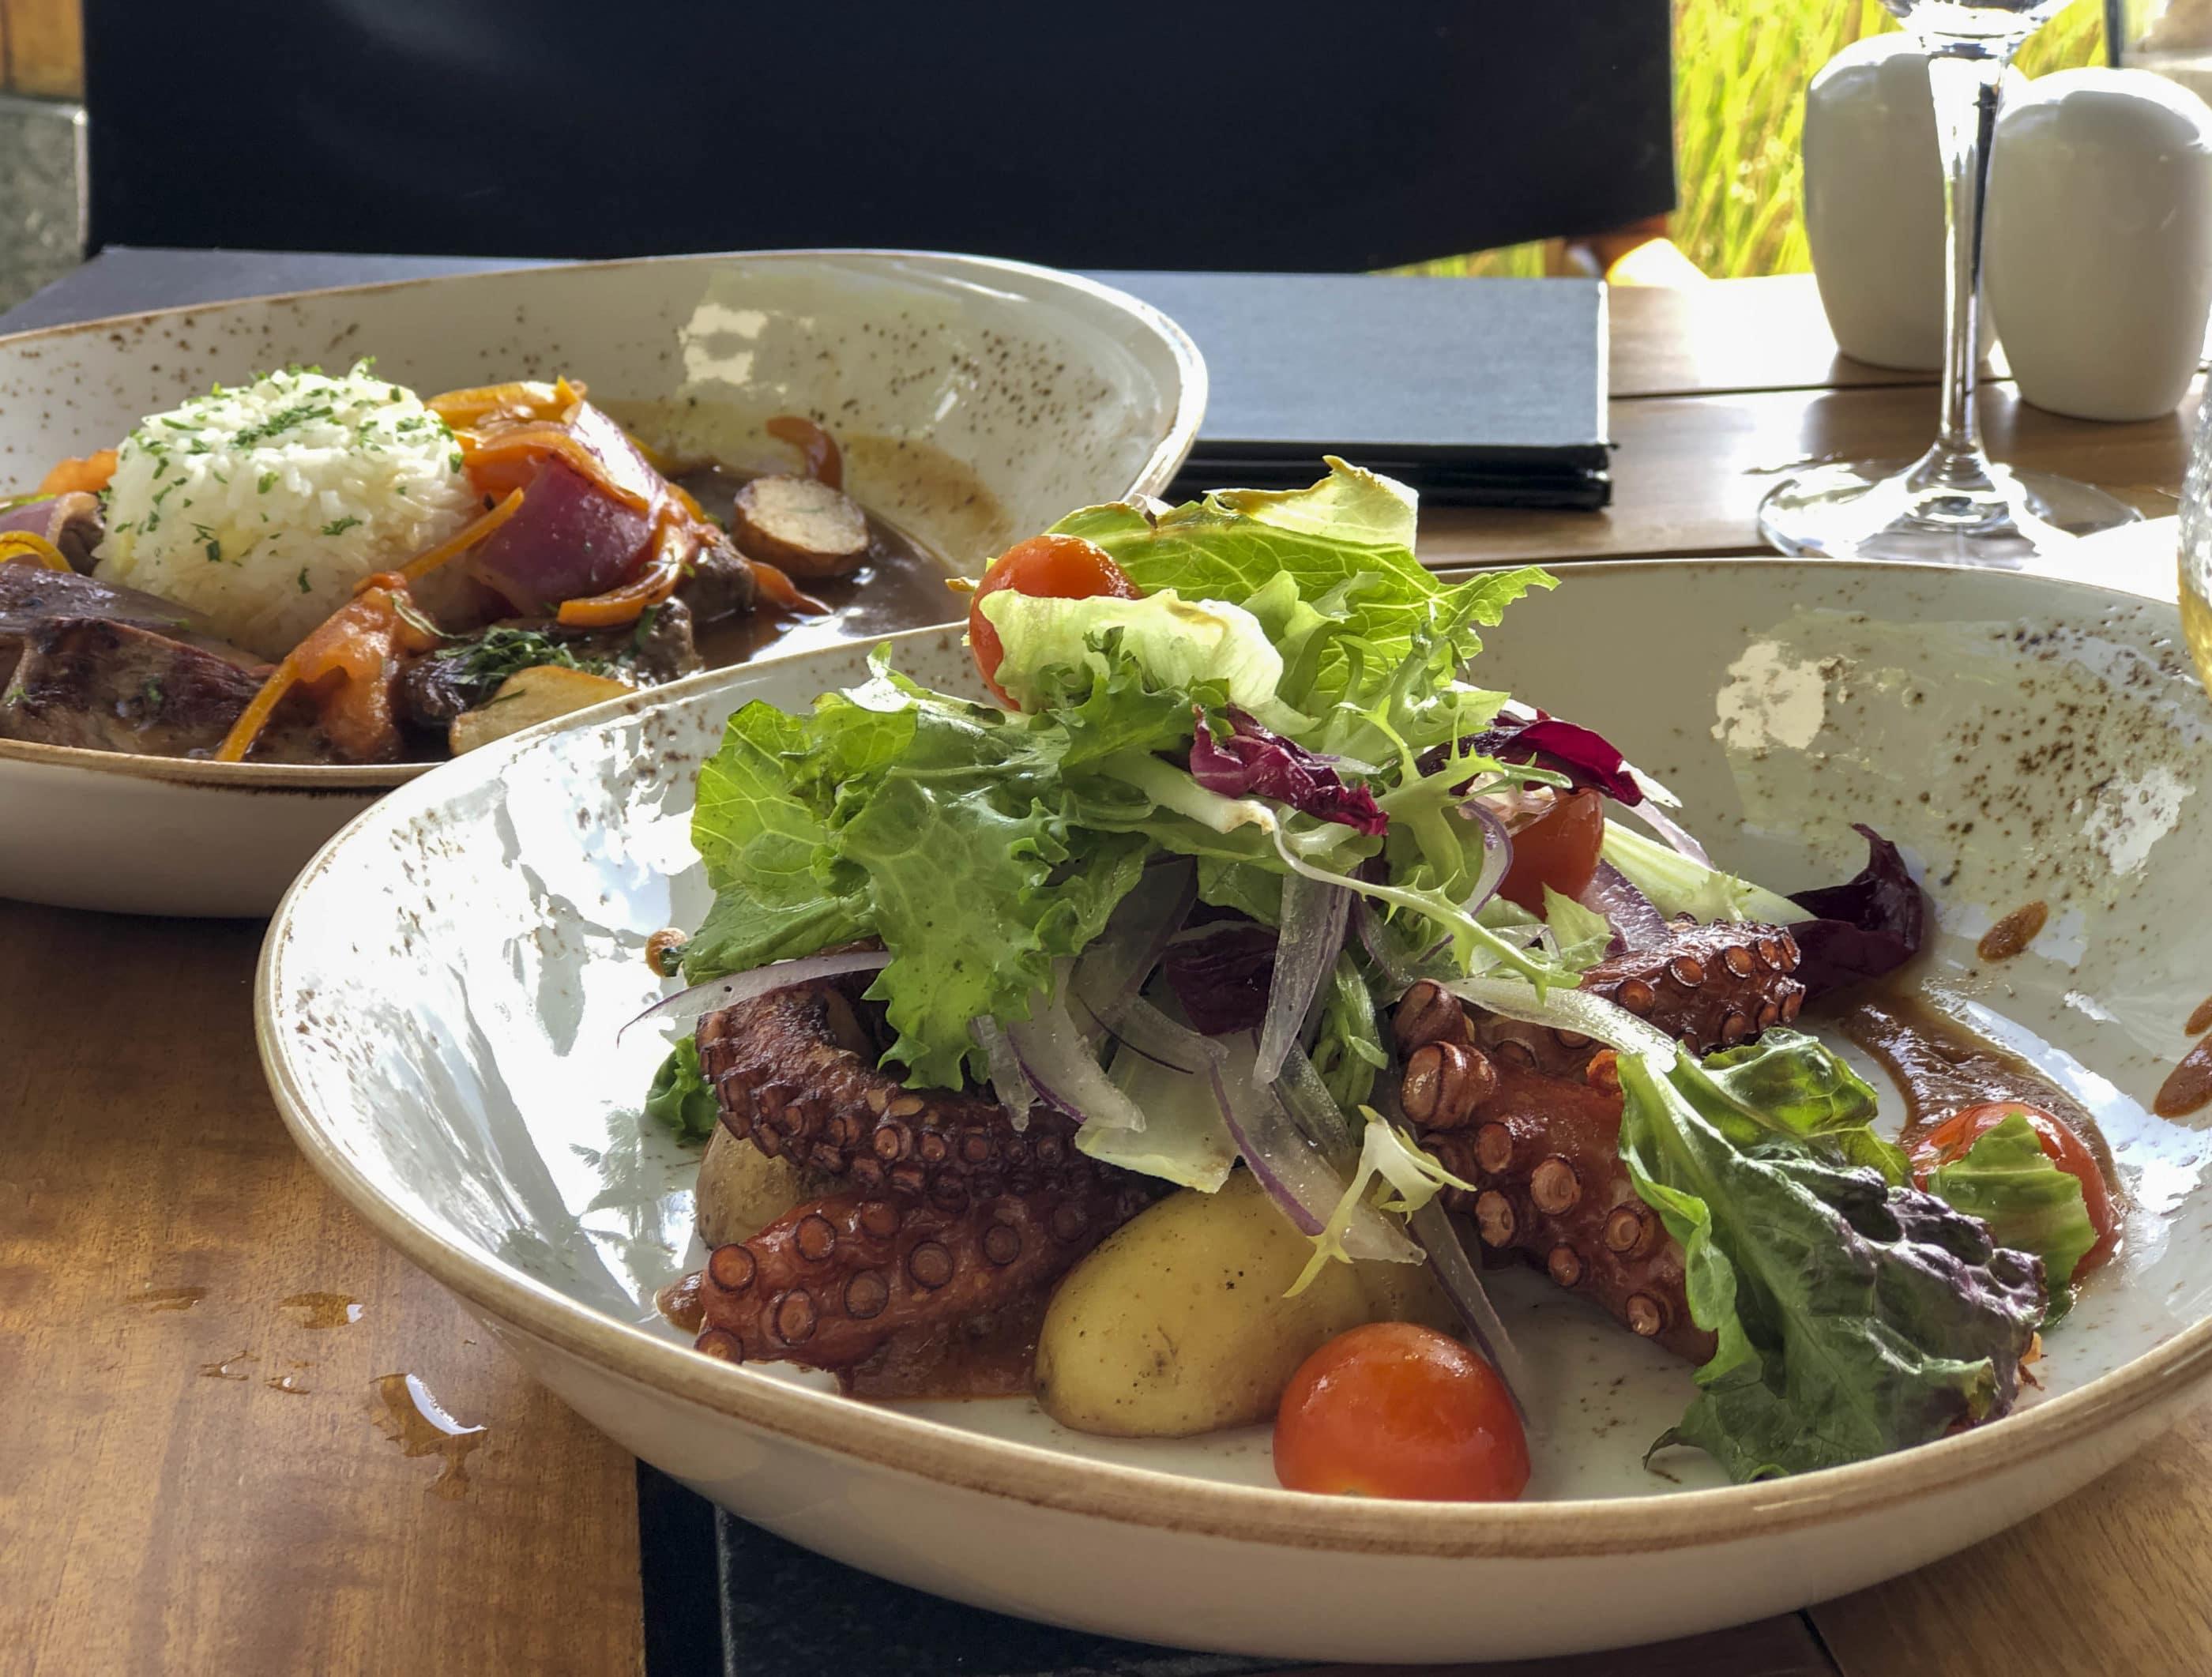 Delicious grilled octopus at Ni, the Peruvian restaurant at NIZUC Resort and Spa